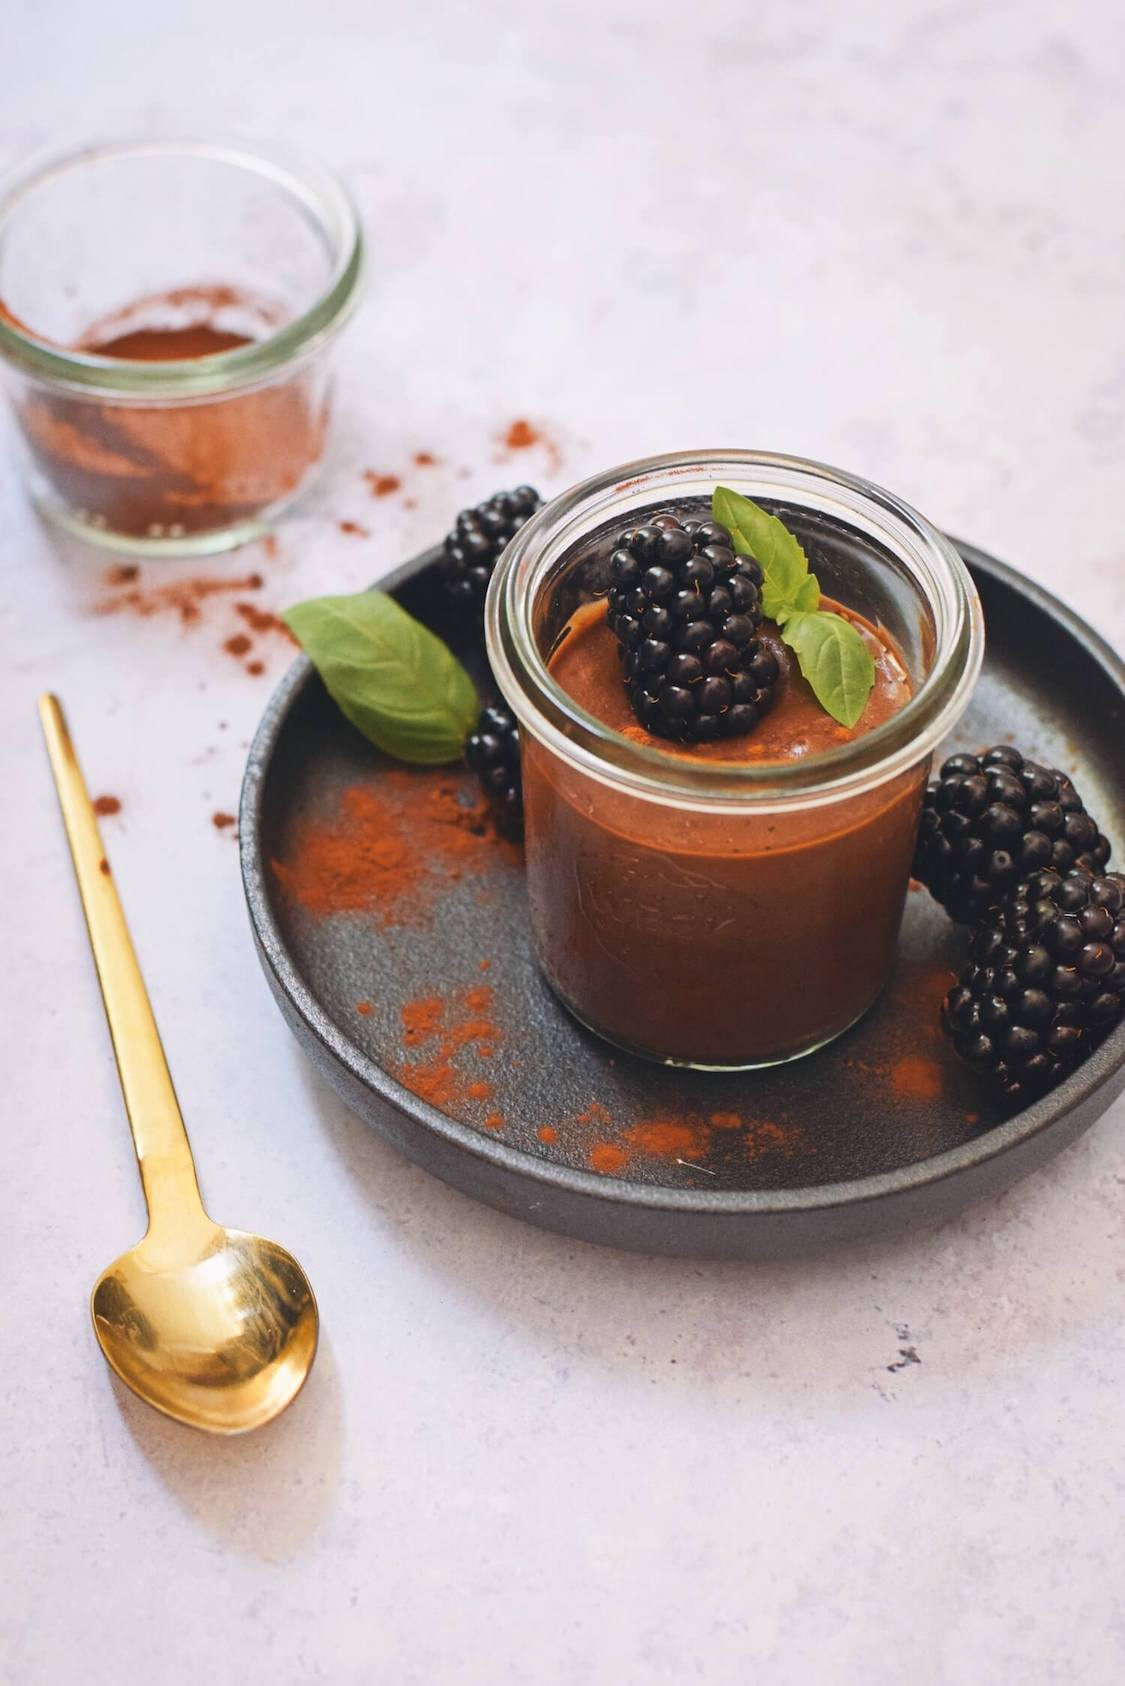 Vegan chocolademousse maak je zo | Slechts 4 ingrediënten